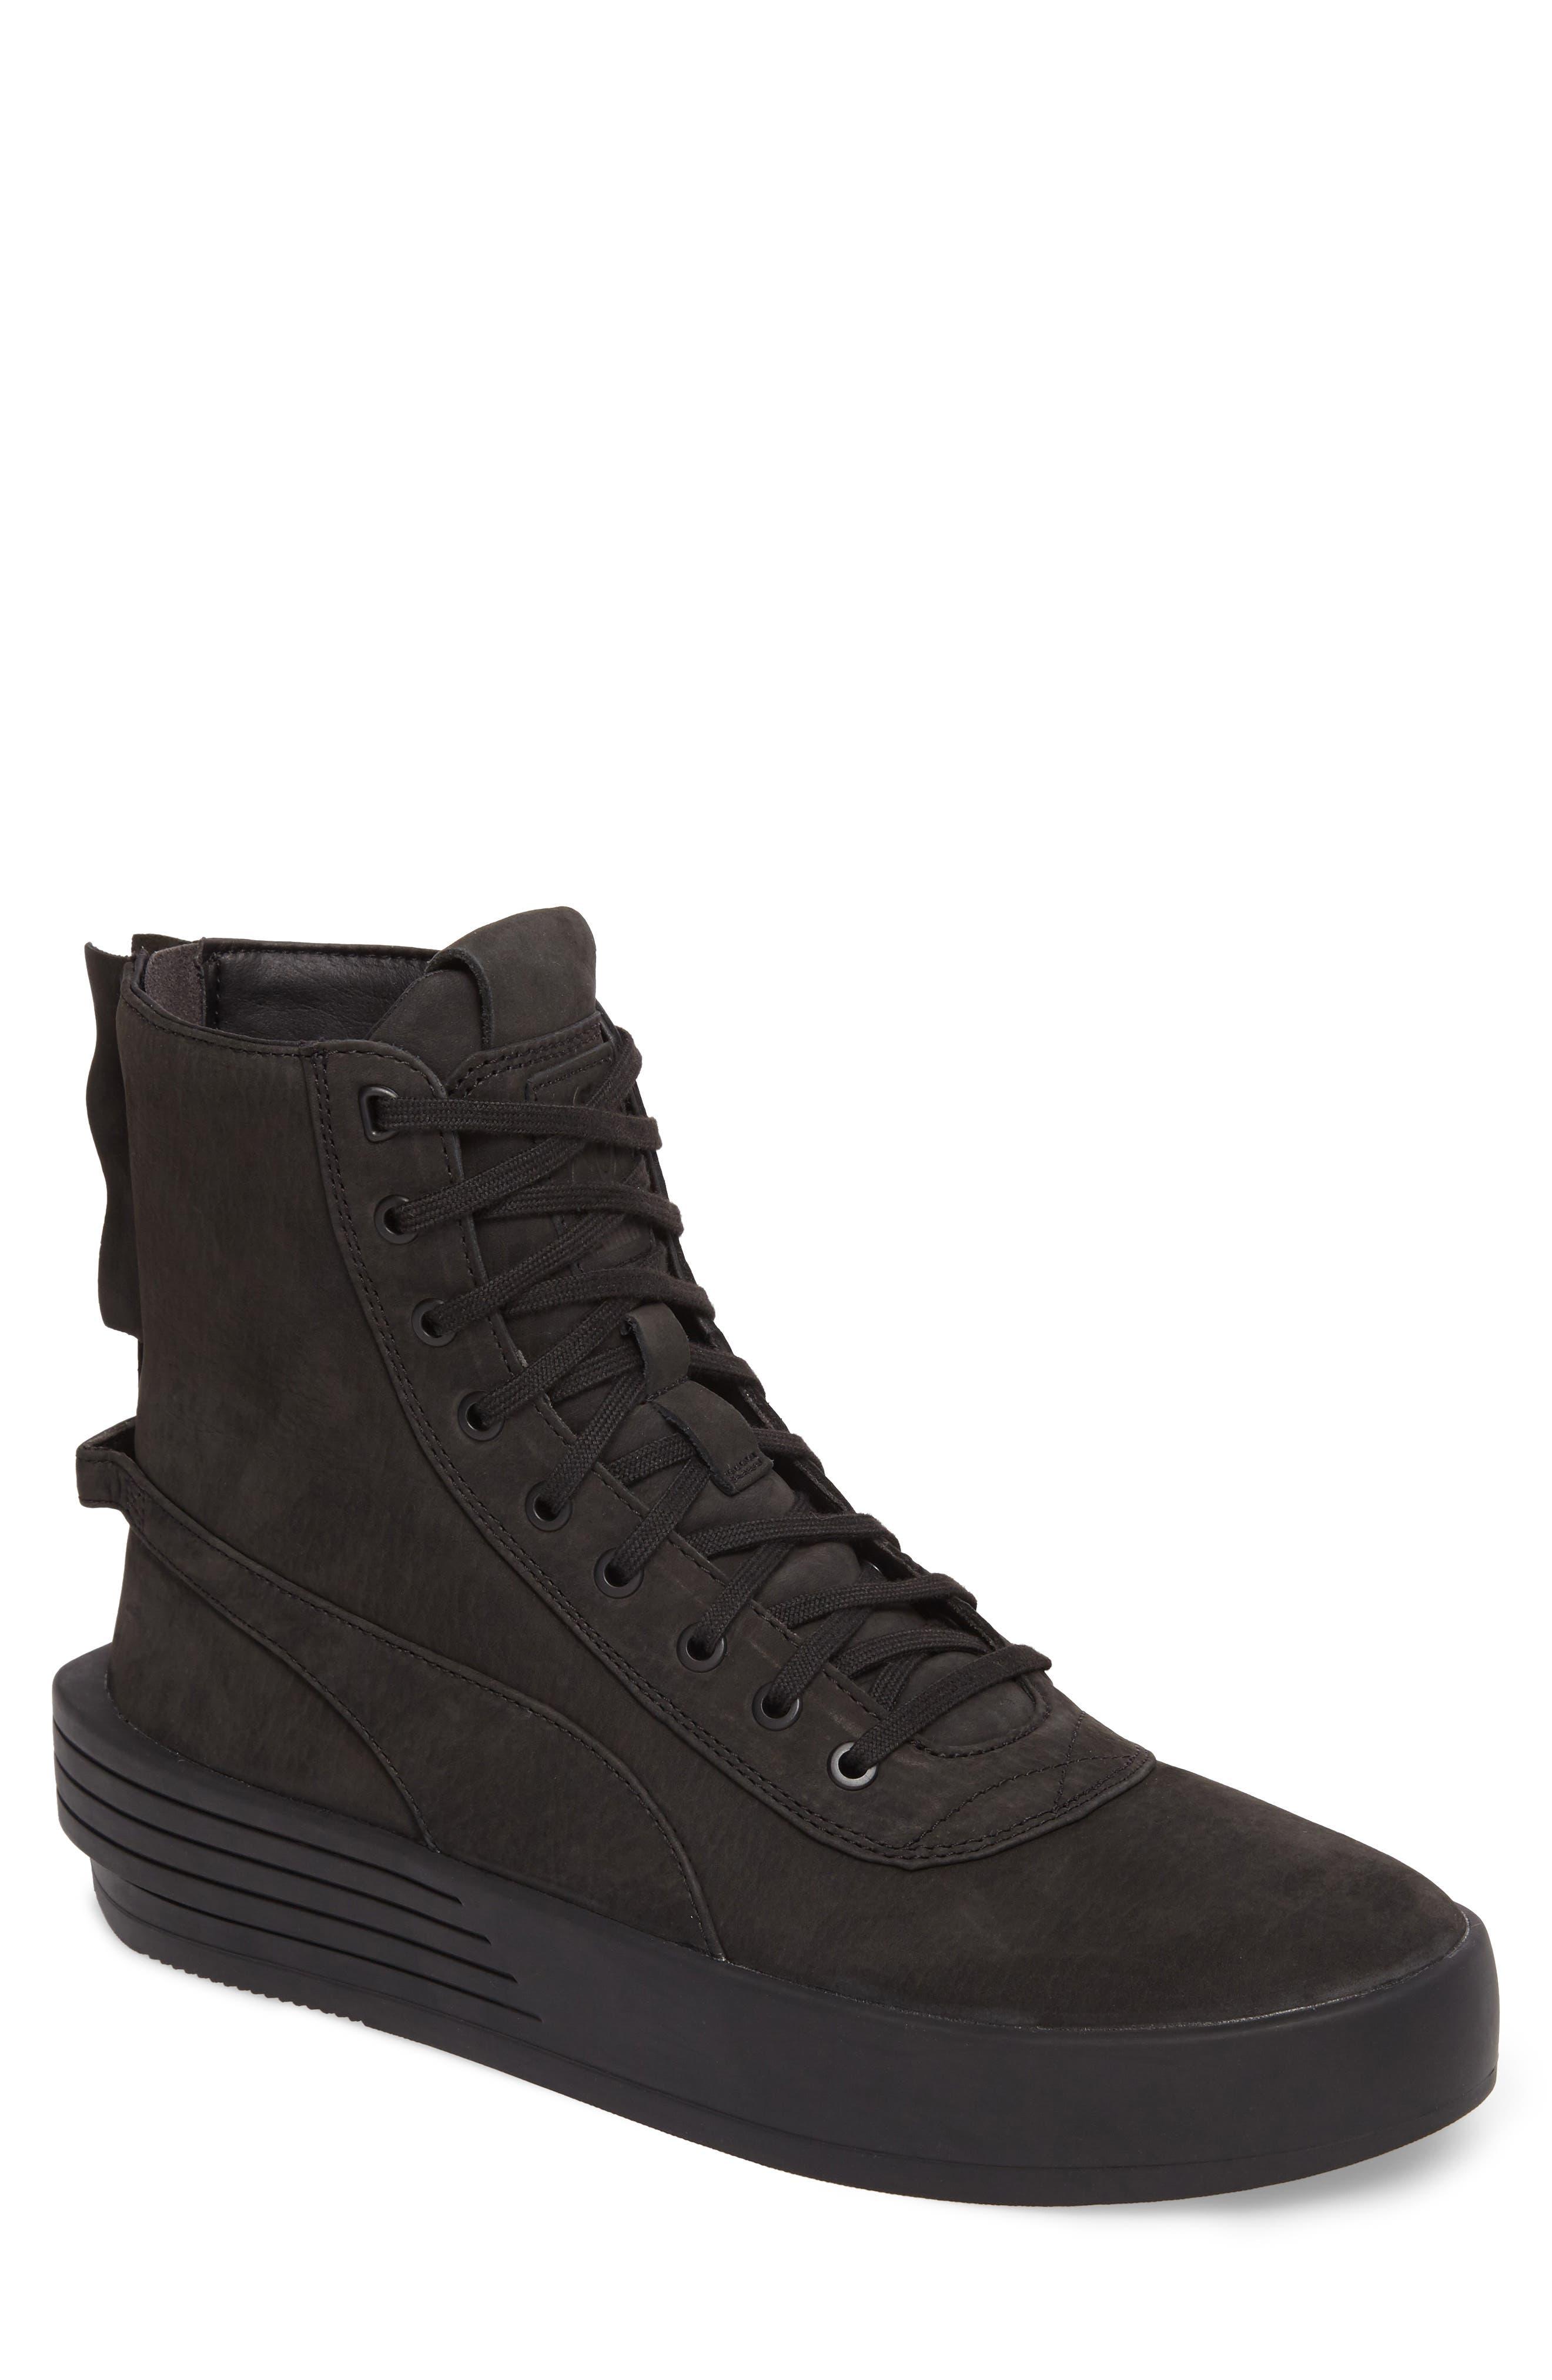 XO Parallel Weeknd Sneaker,                         Main,                         color, 001